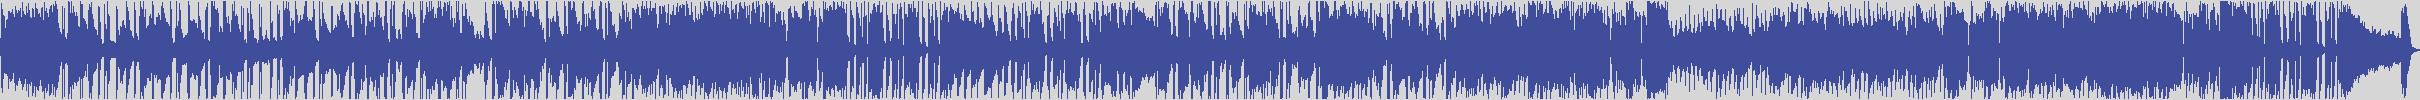 gold_hit_records [GHR005] Corinna Romanoni - Life is Yours [Radio Edit] audio wave form